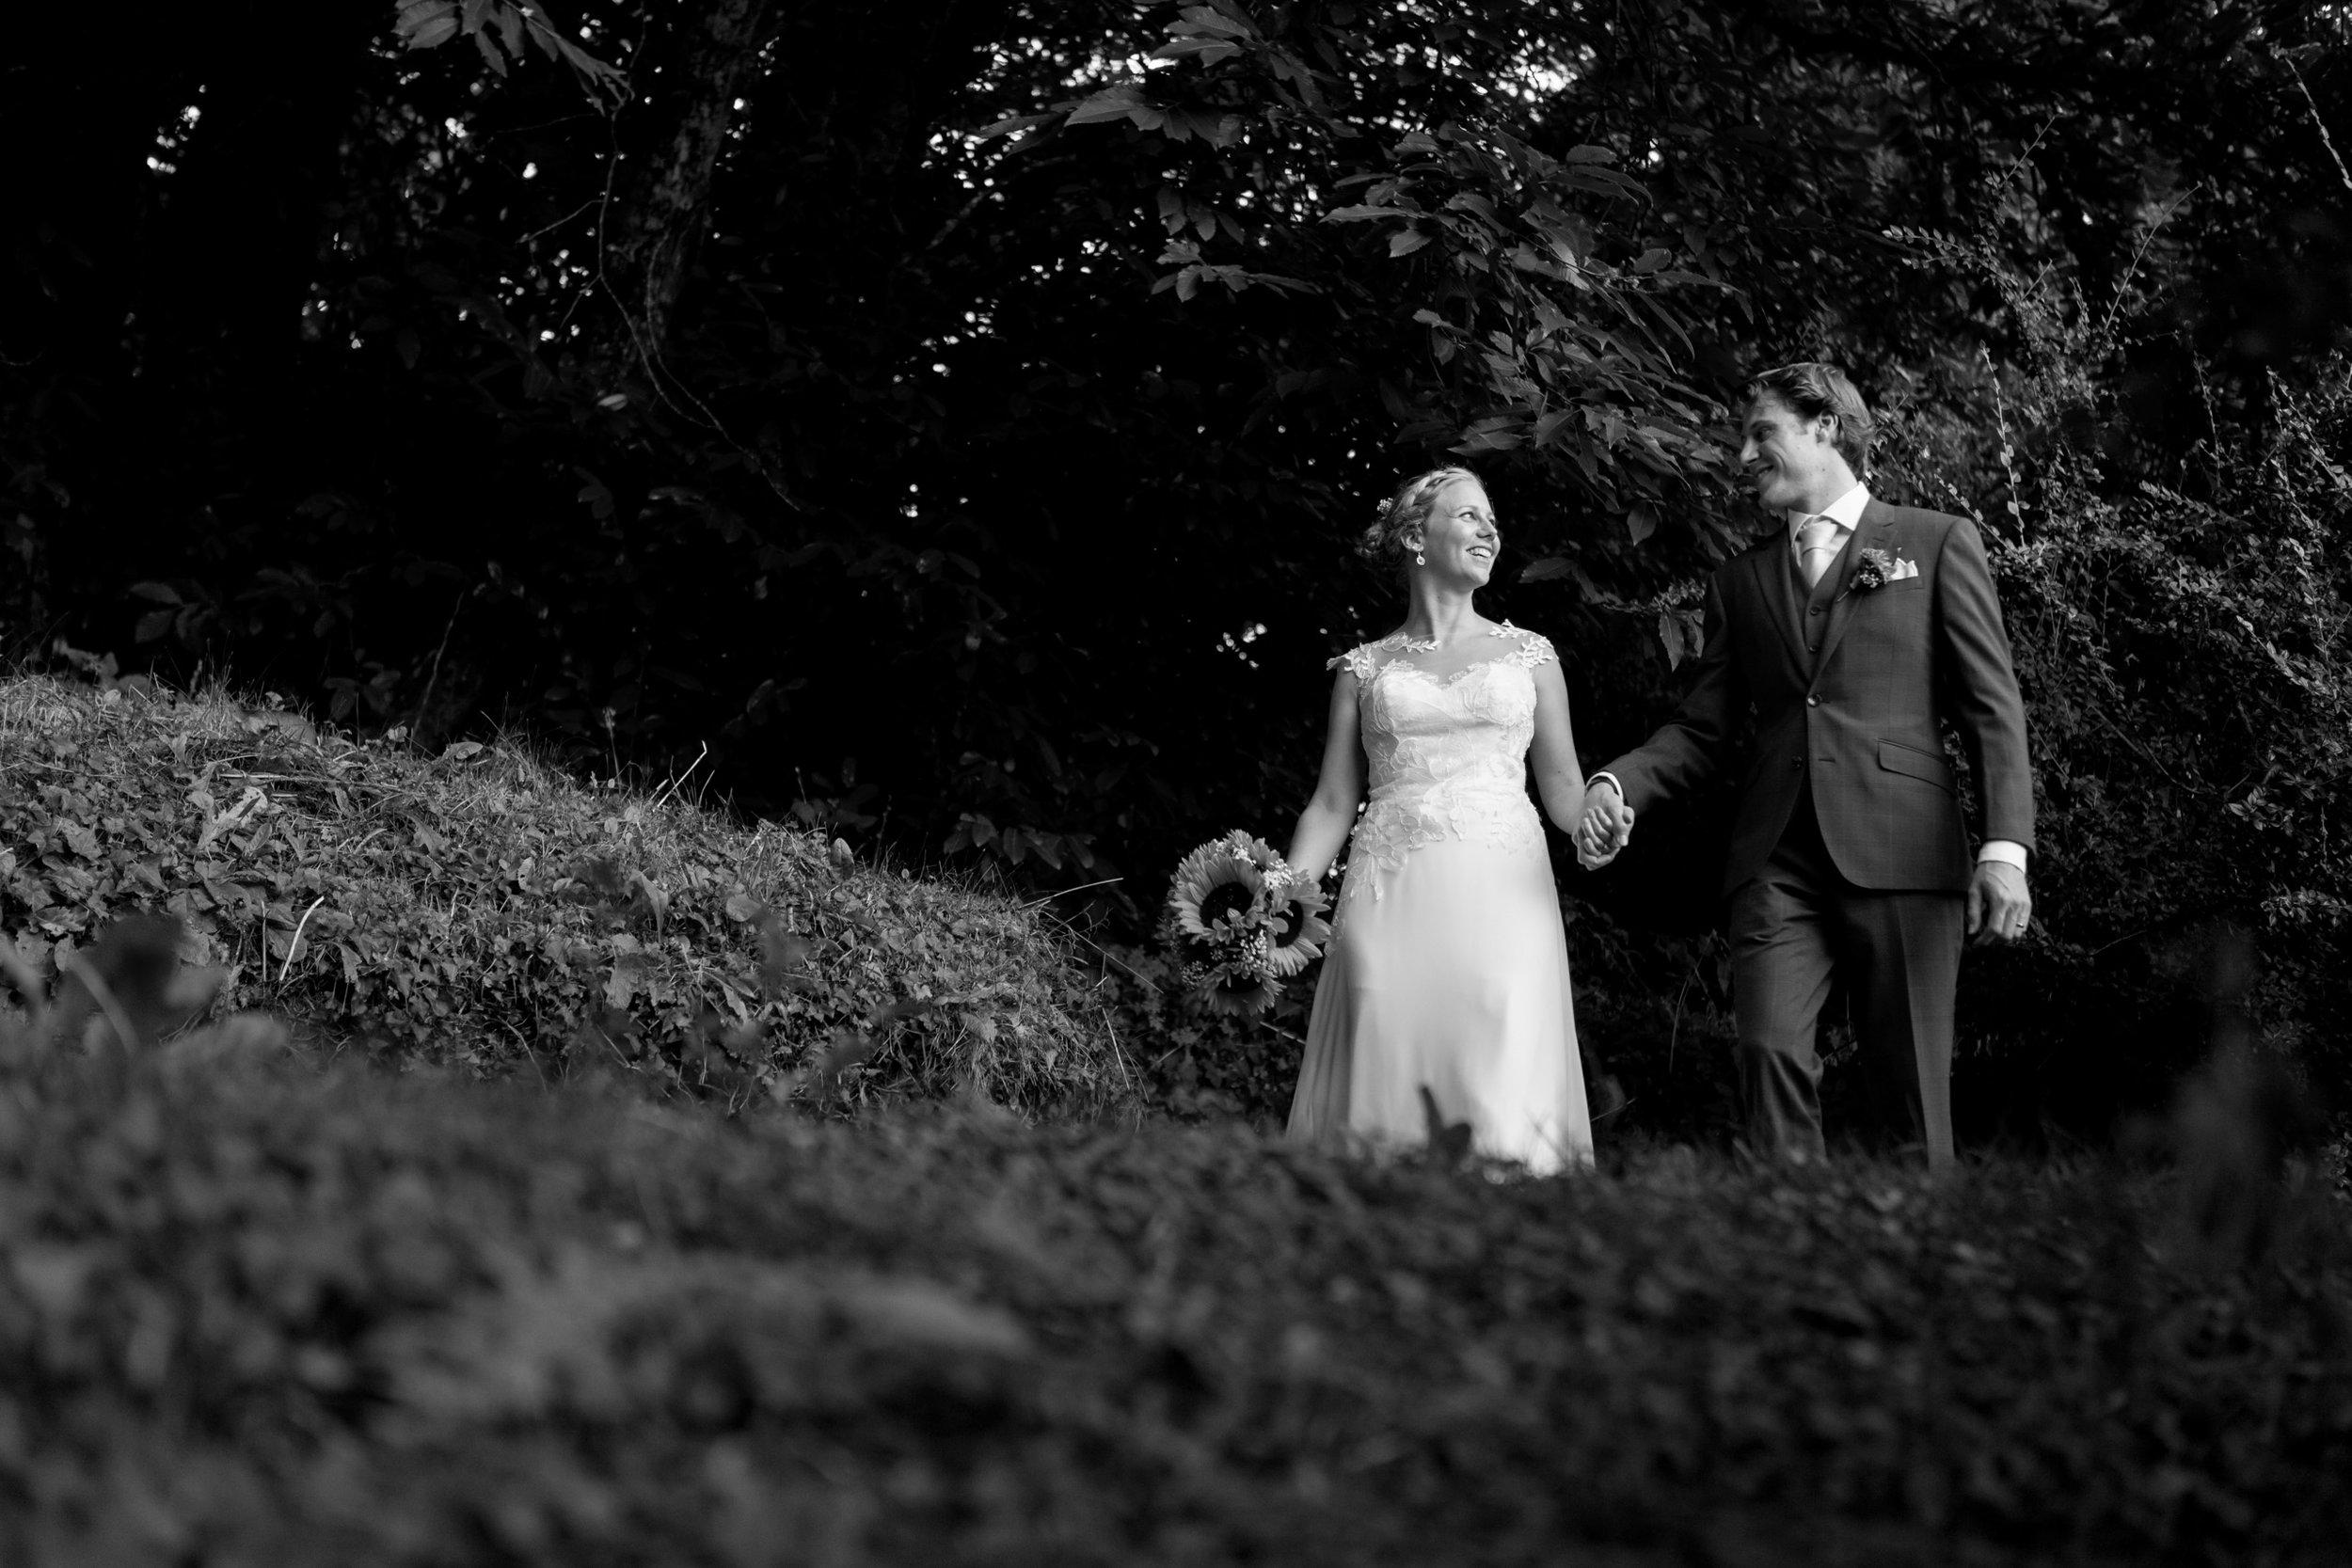 Bucklands-Tout-Saints-Hotel-Devon-Wedding-Photography-34.jpg